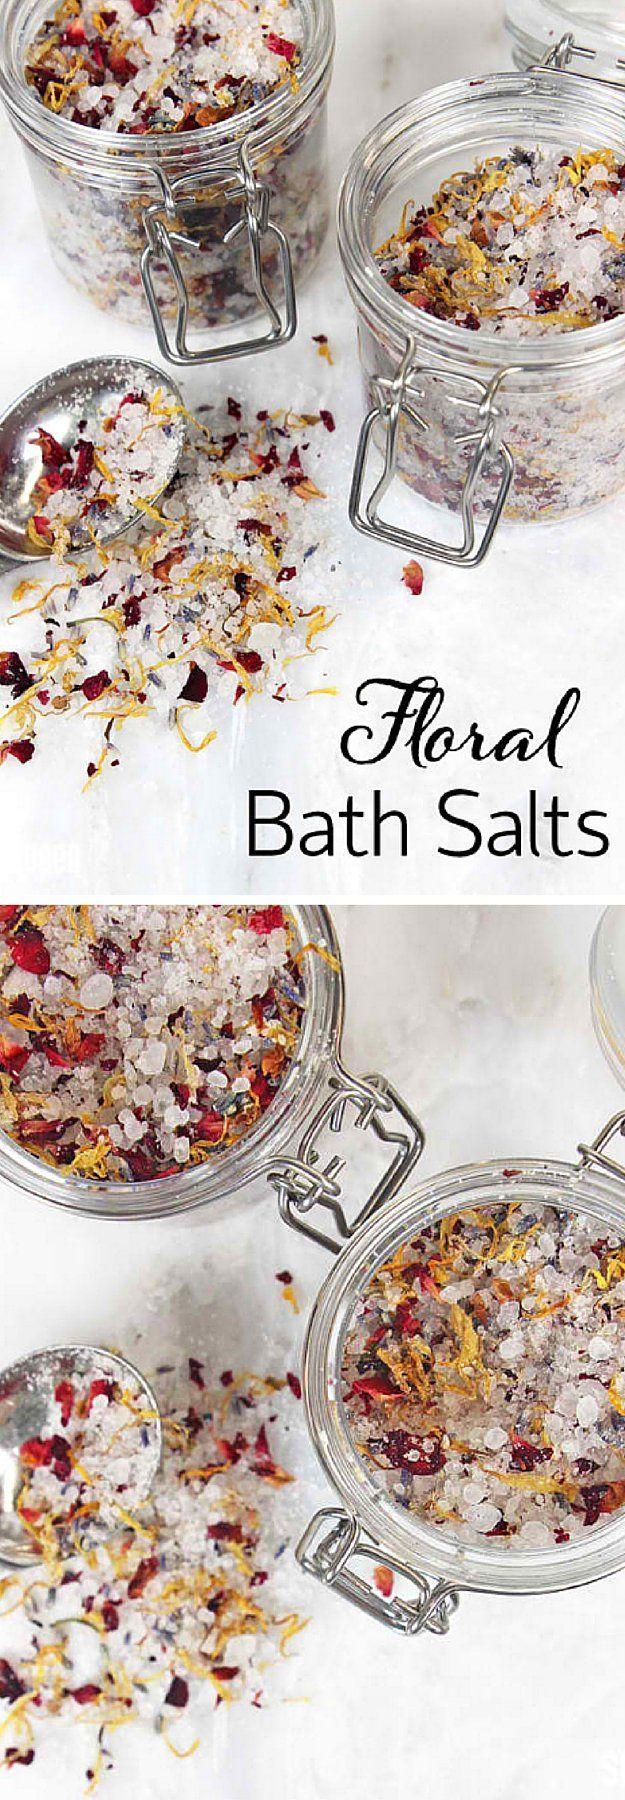 how to make mdpv bath salts